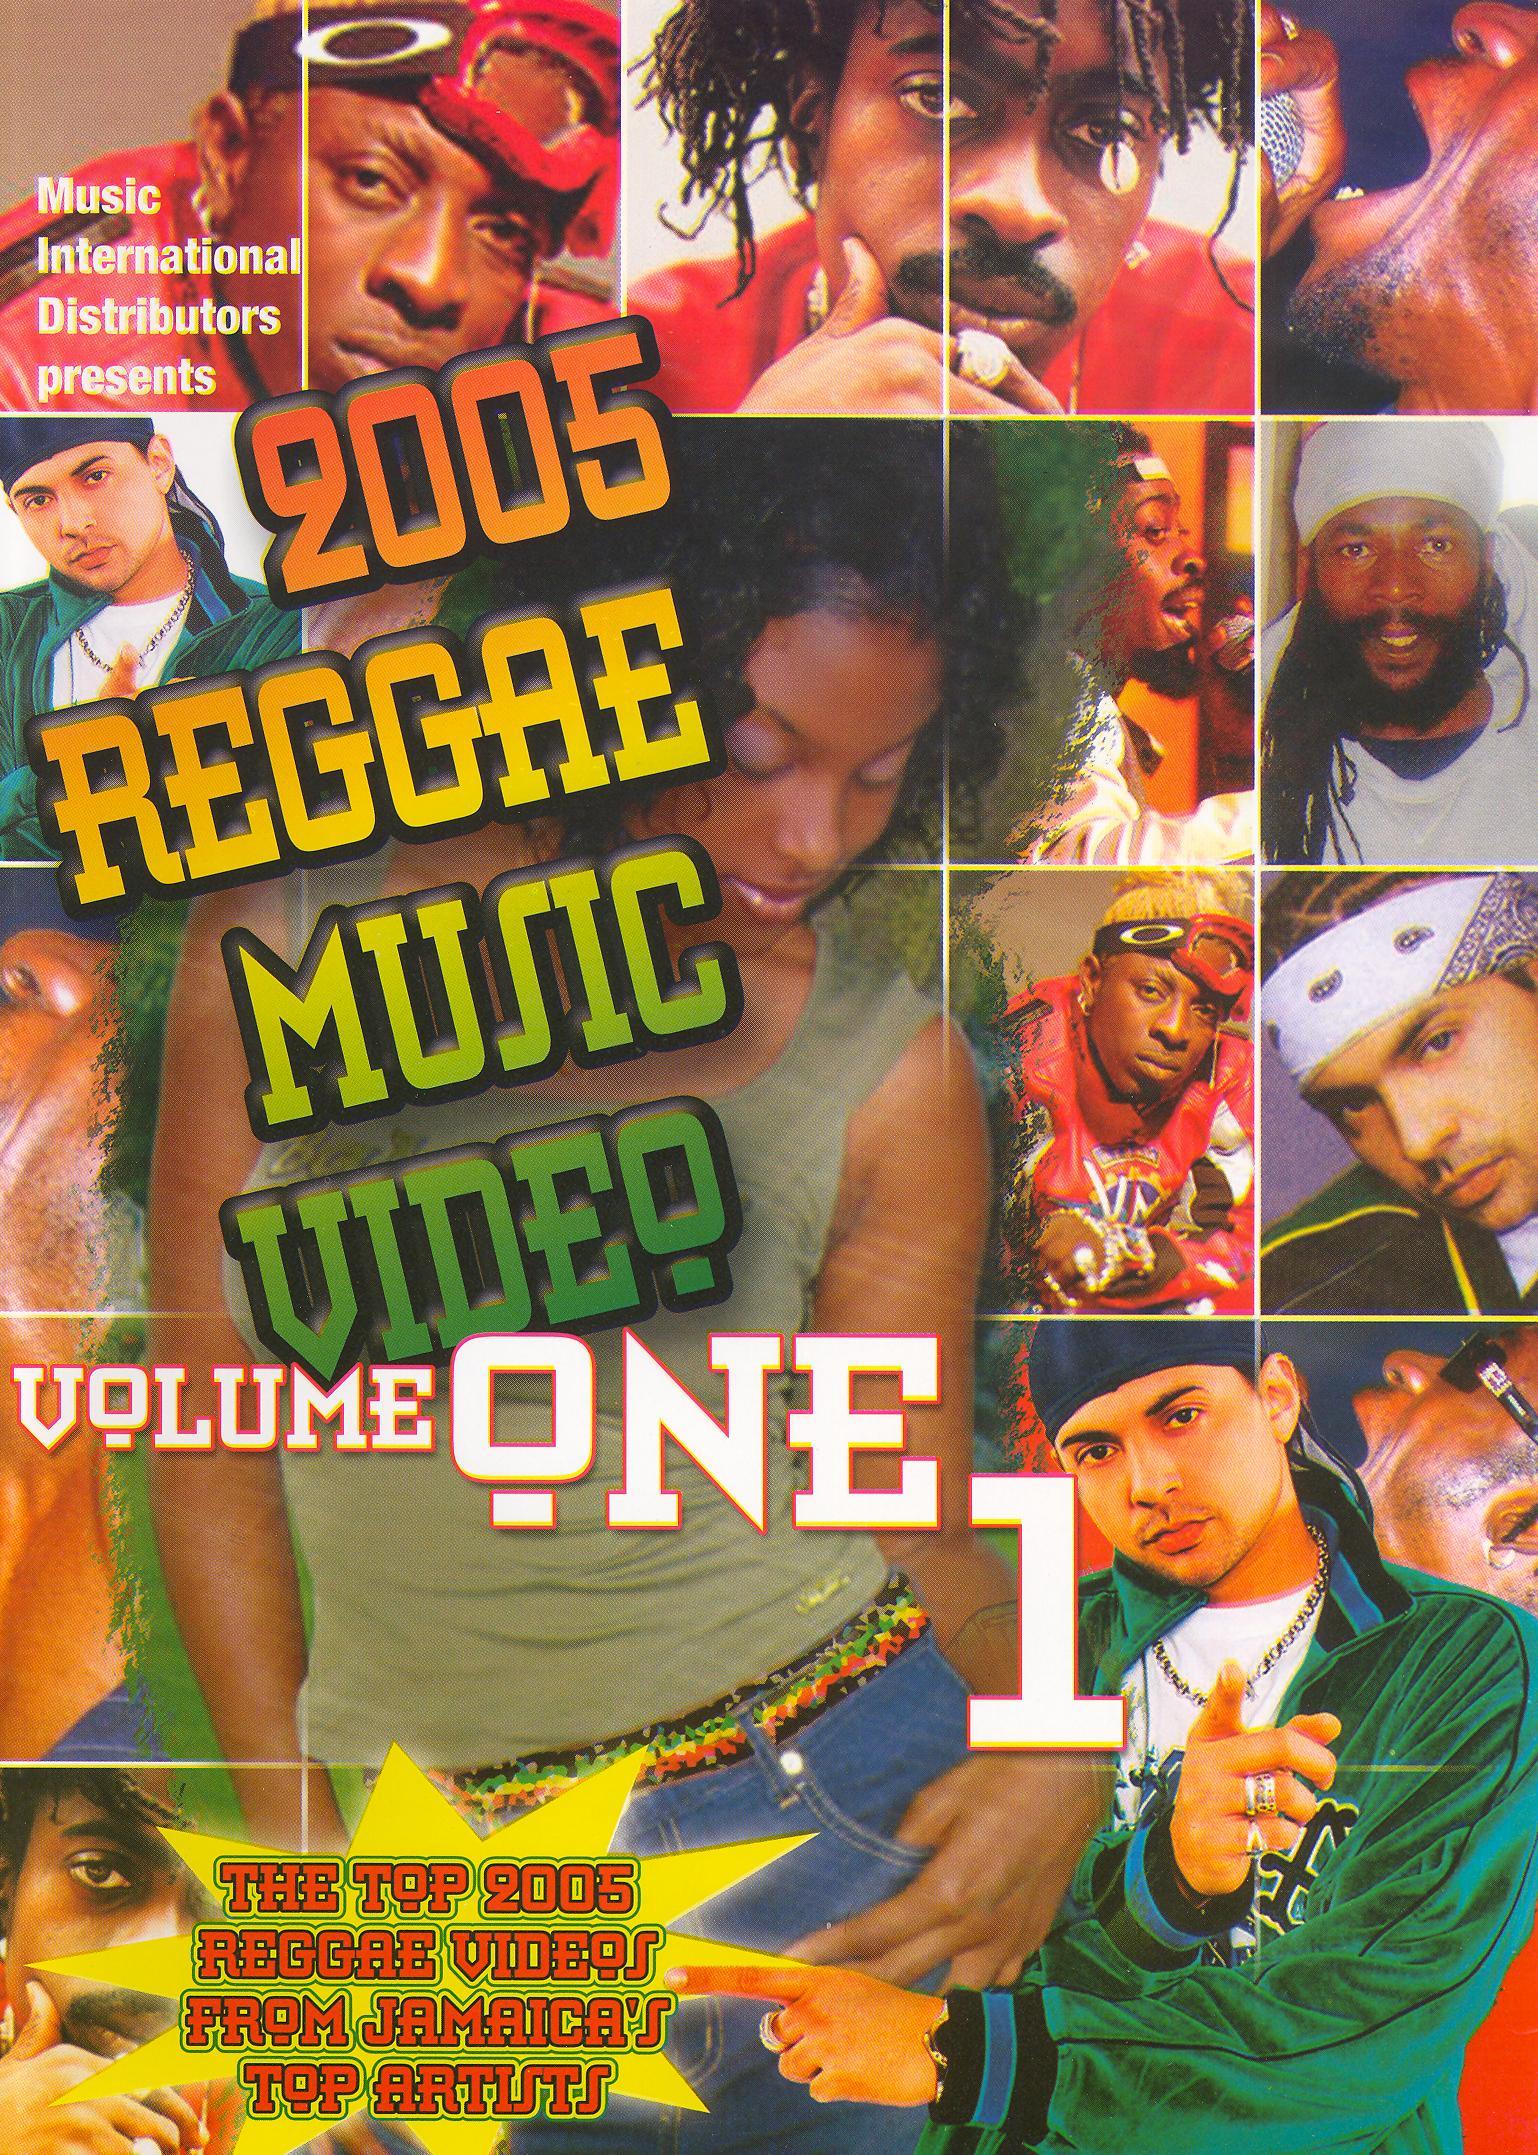 2005 Reggae Music Video, Vol. 4